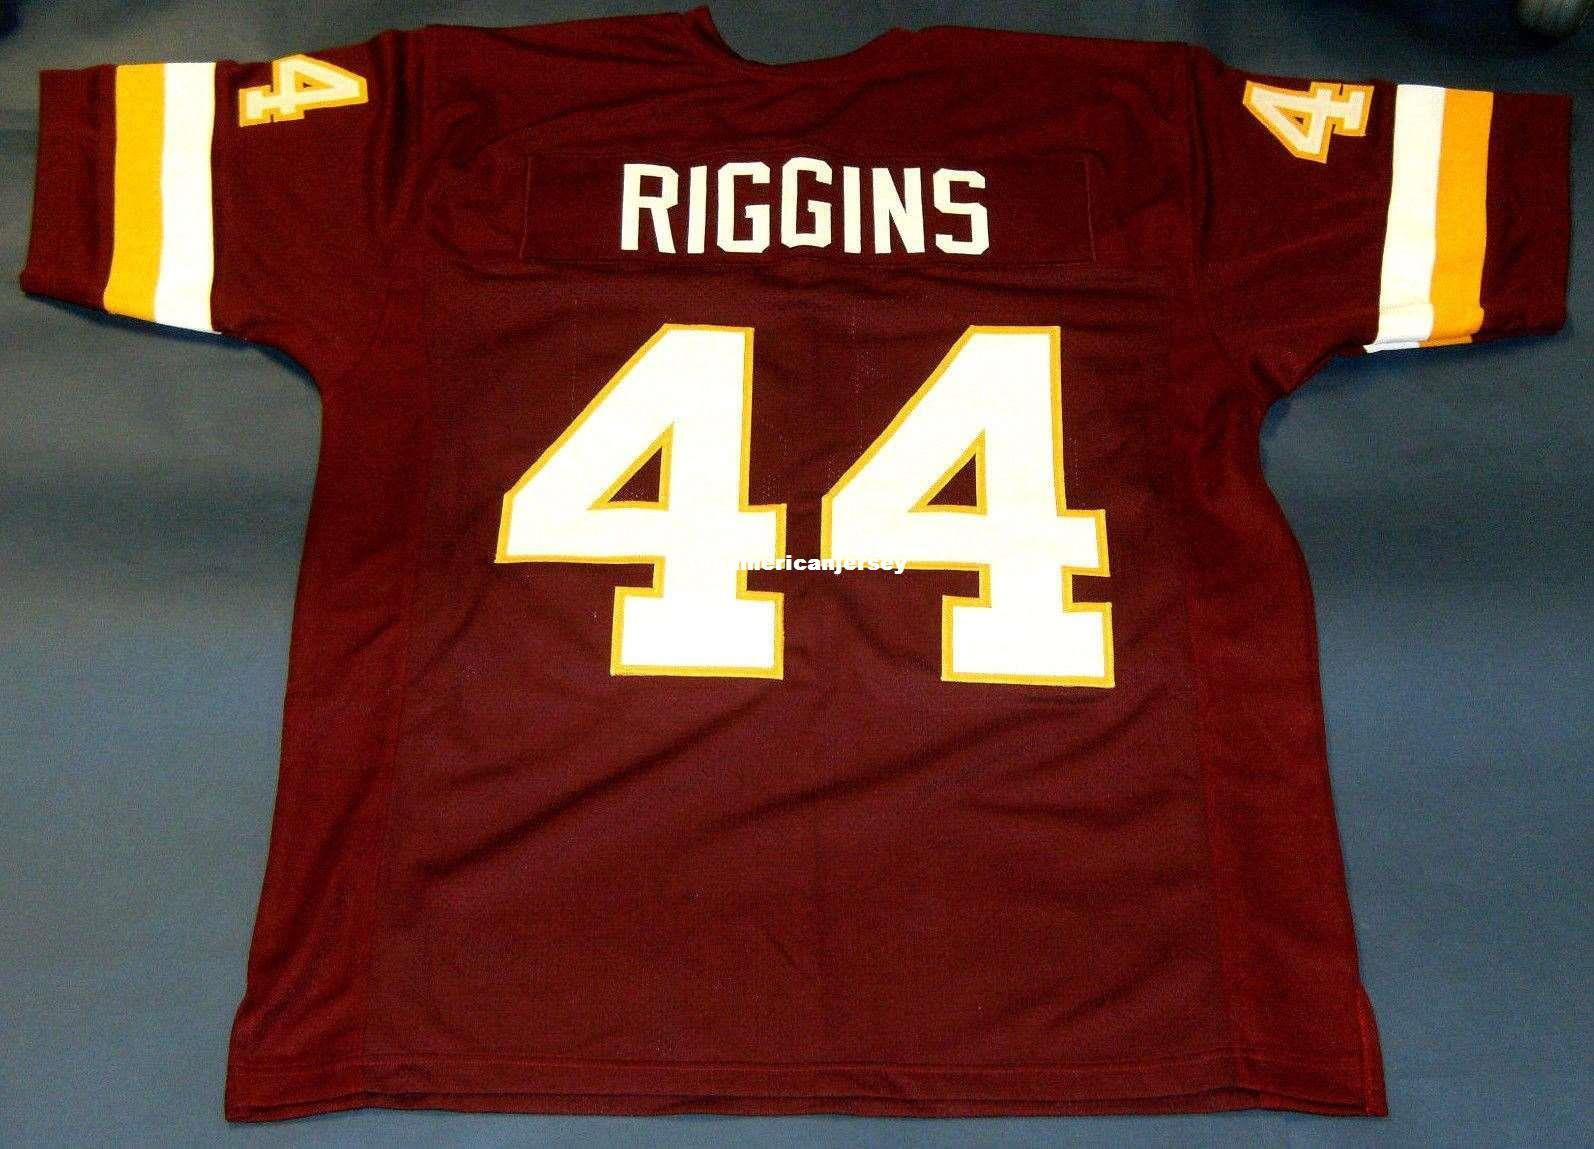 quality design 15e7c 4ceaf Cheap retro #44 JOHN RIGGINS CUSTOM MITCHELL & NESS Jersey wine red Mens  Stitching Top S-5XL,6XL Football Jerseys Running